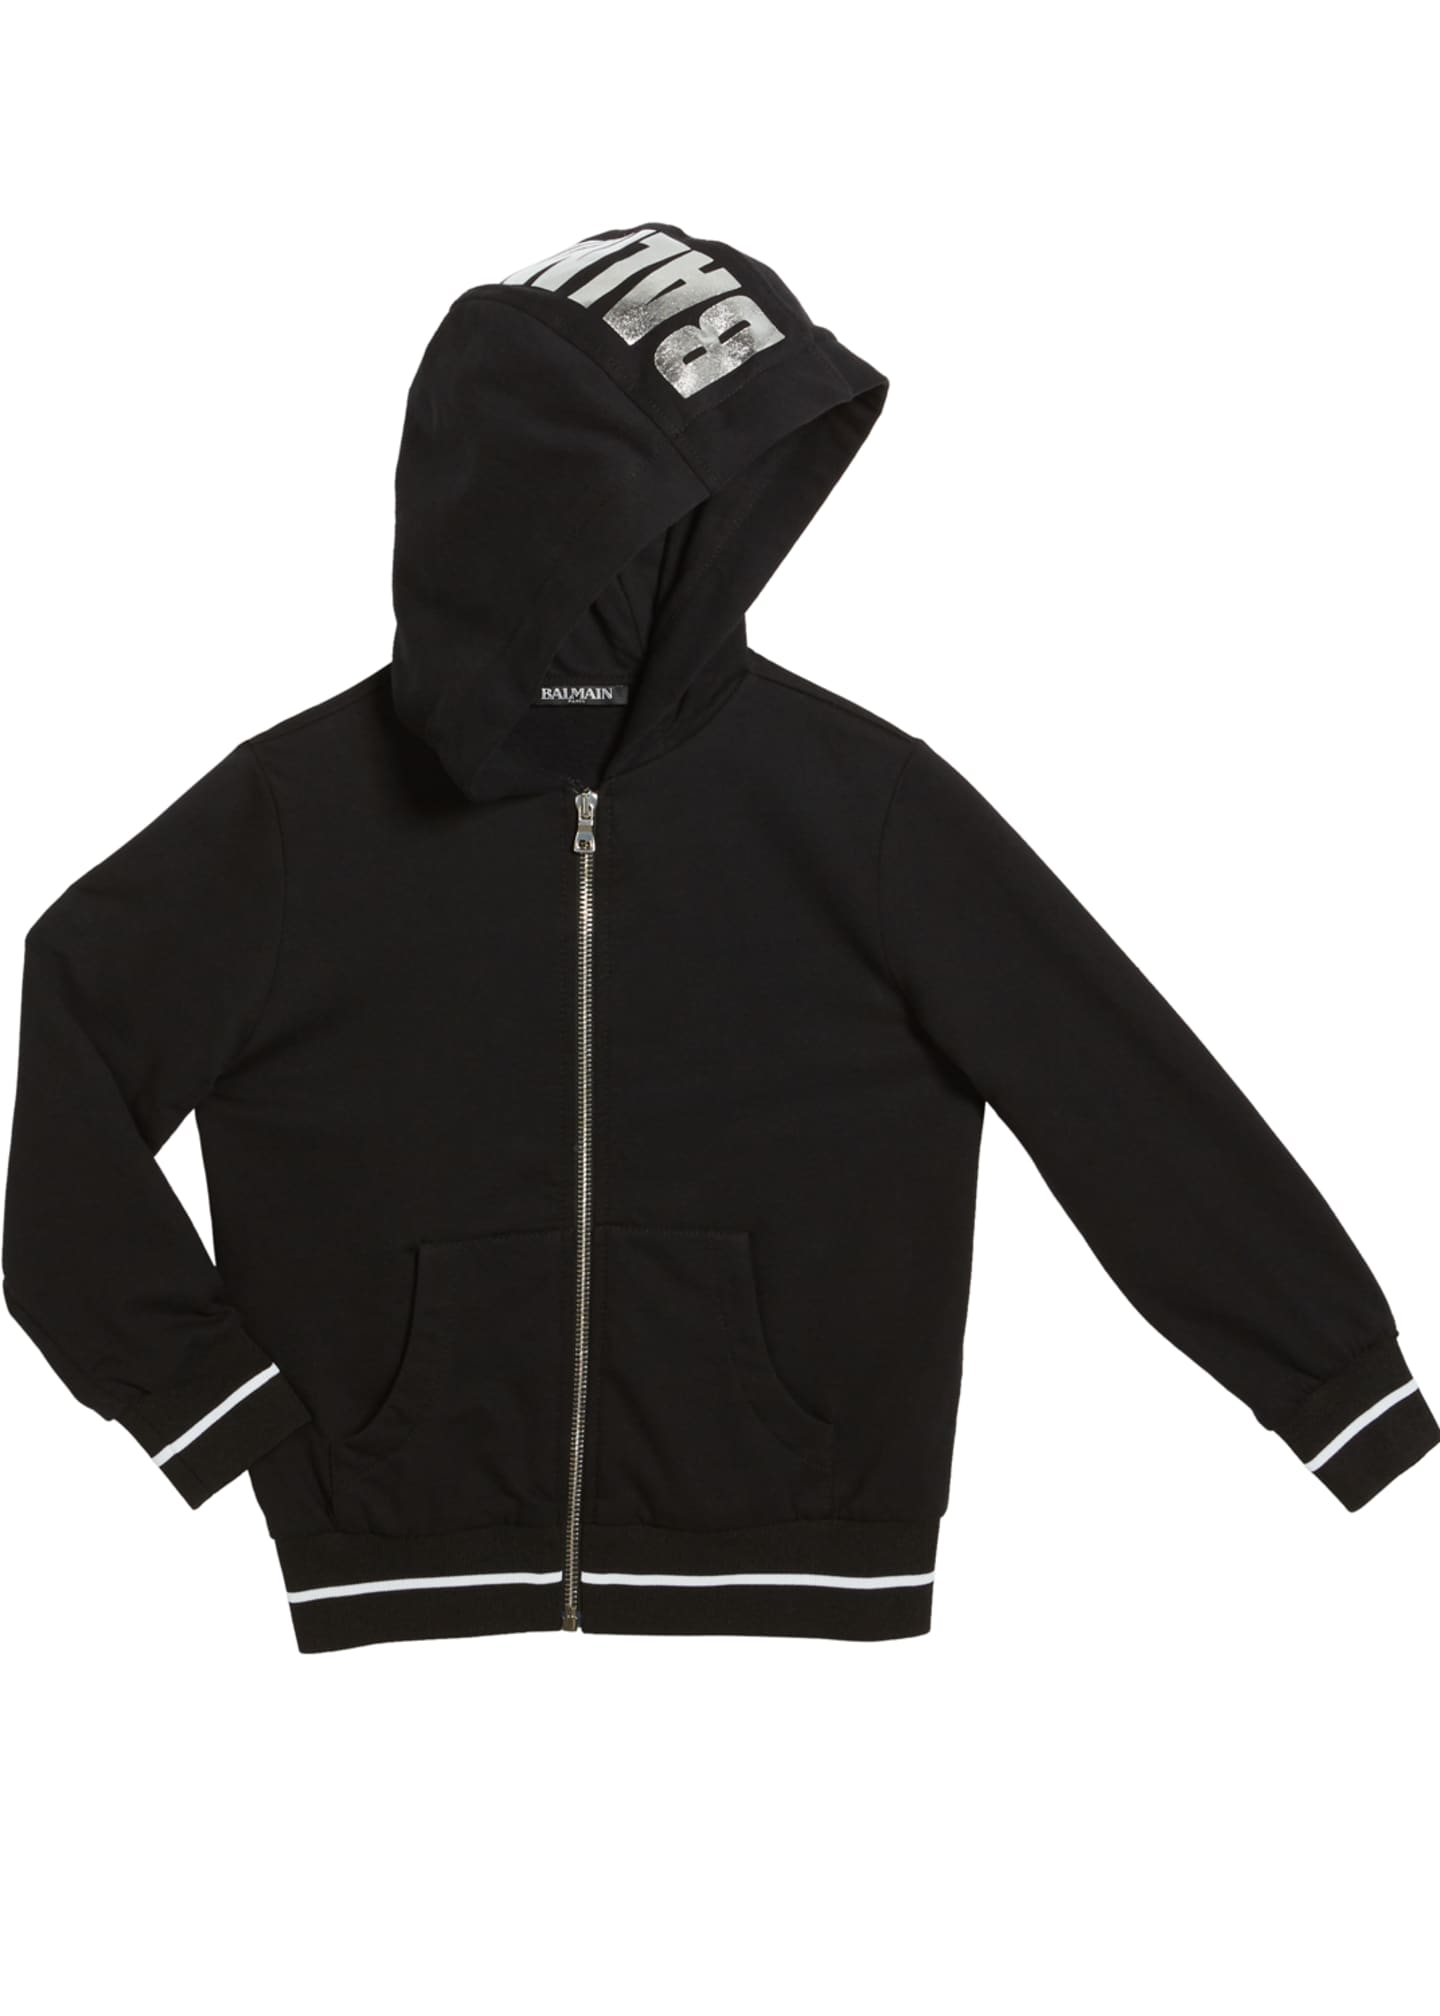 Balmain Kid's Zip-Up Hoodie w/ Metallic Logo, Size